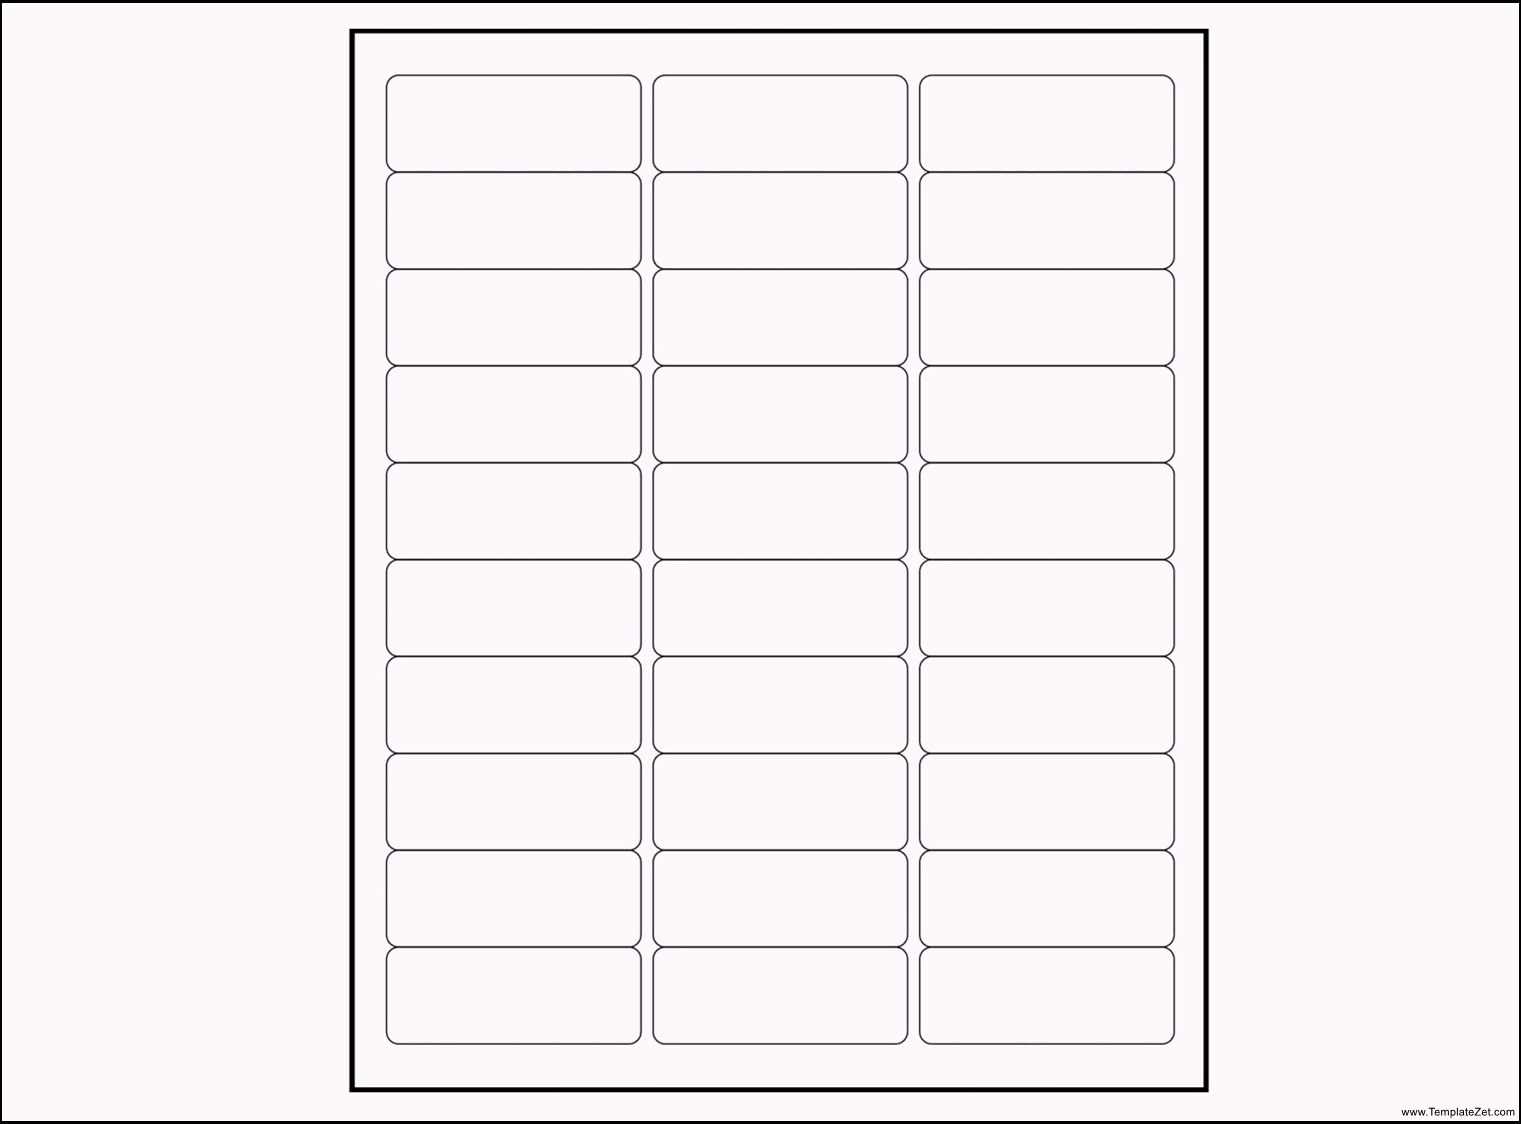 create a label template in google  Address Label Template Google Docs | printable label templates - create a label template in google